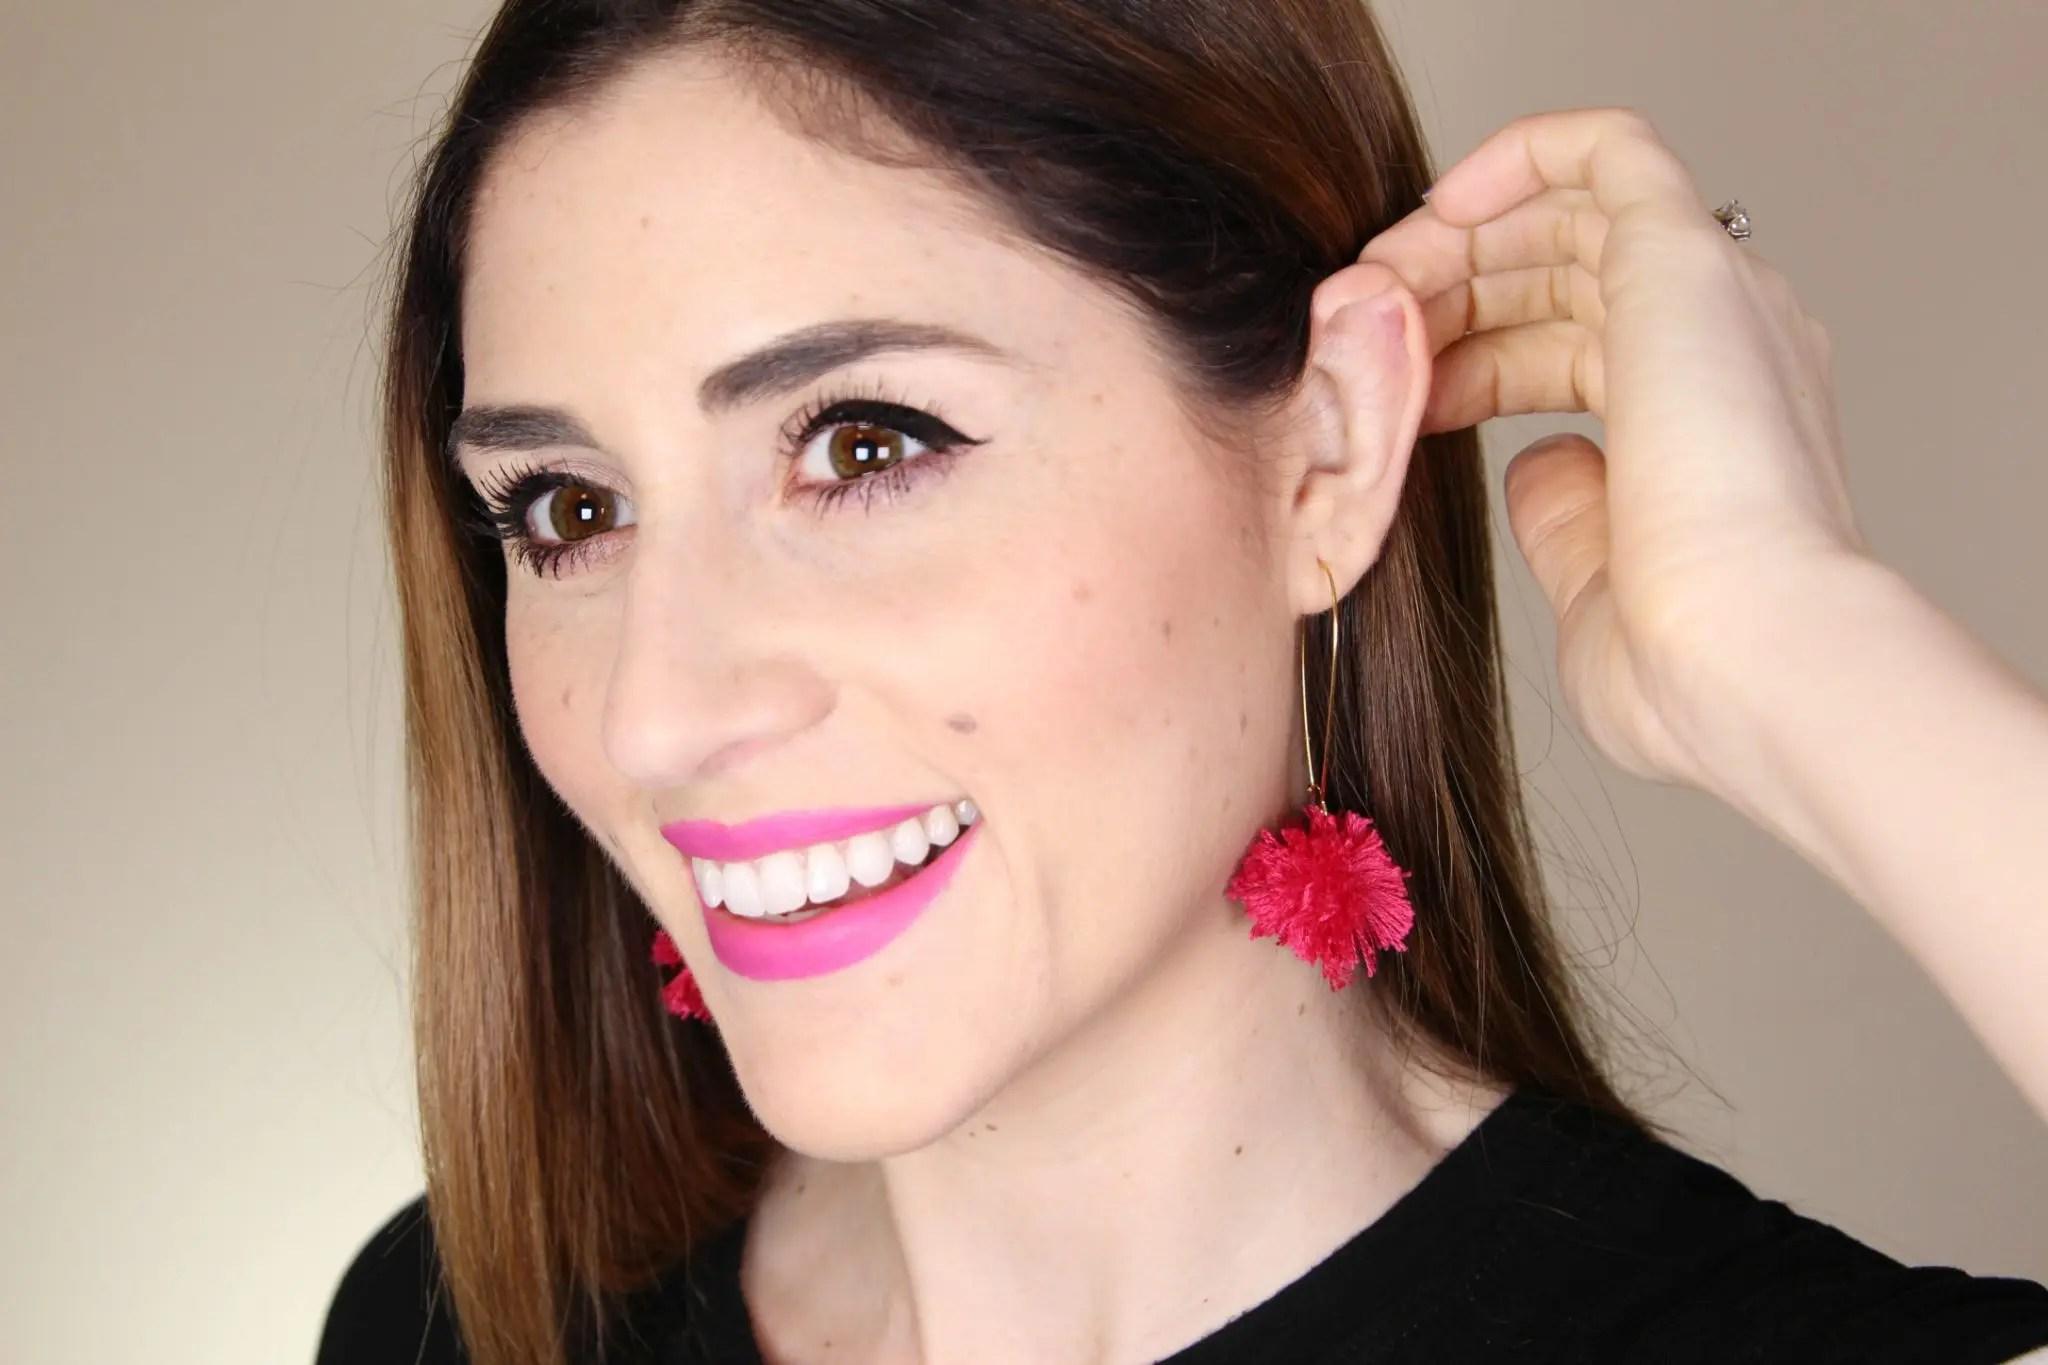 DIY Pom Pom Earrings | How to Make fun pompom earrings